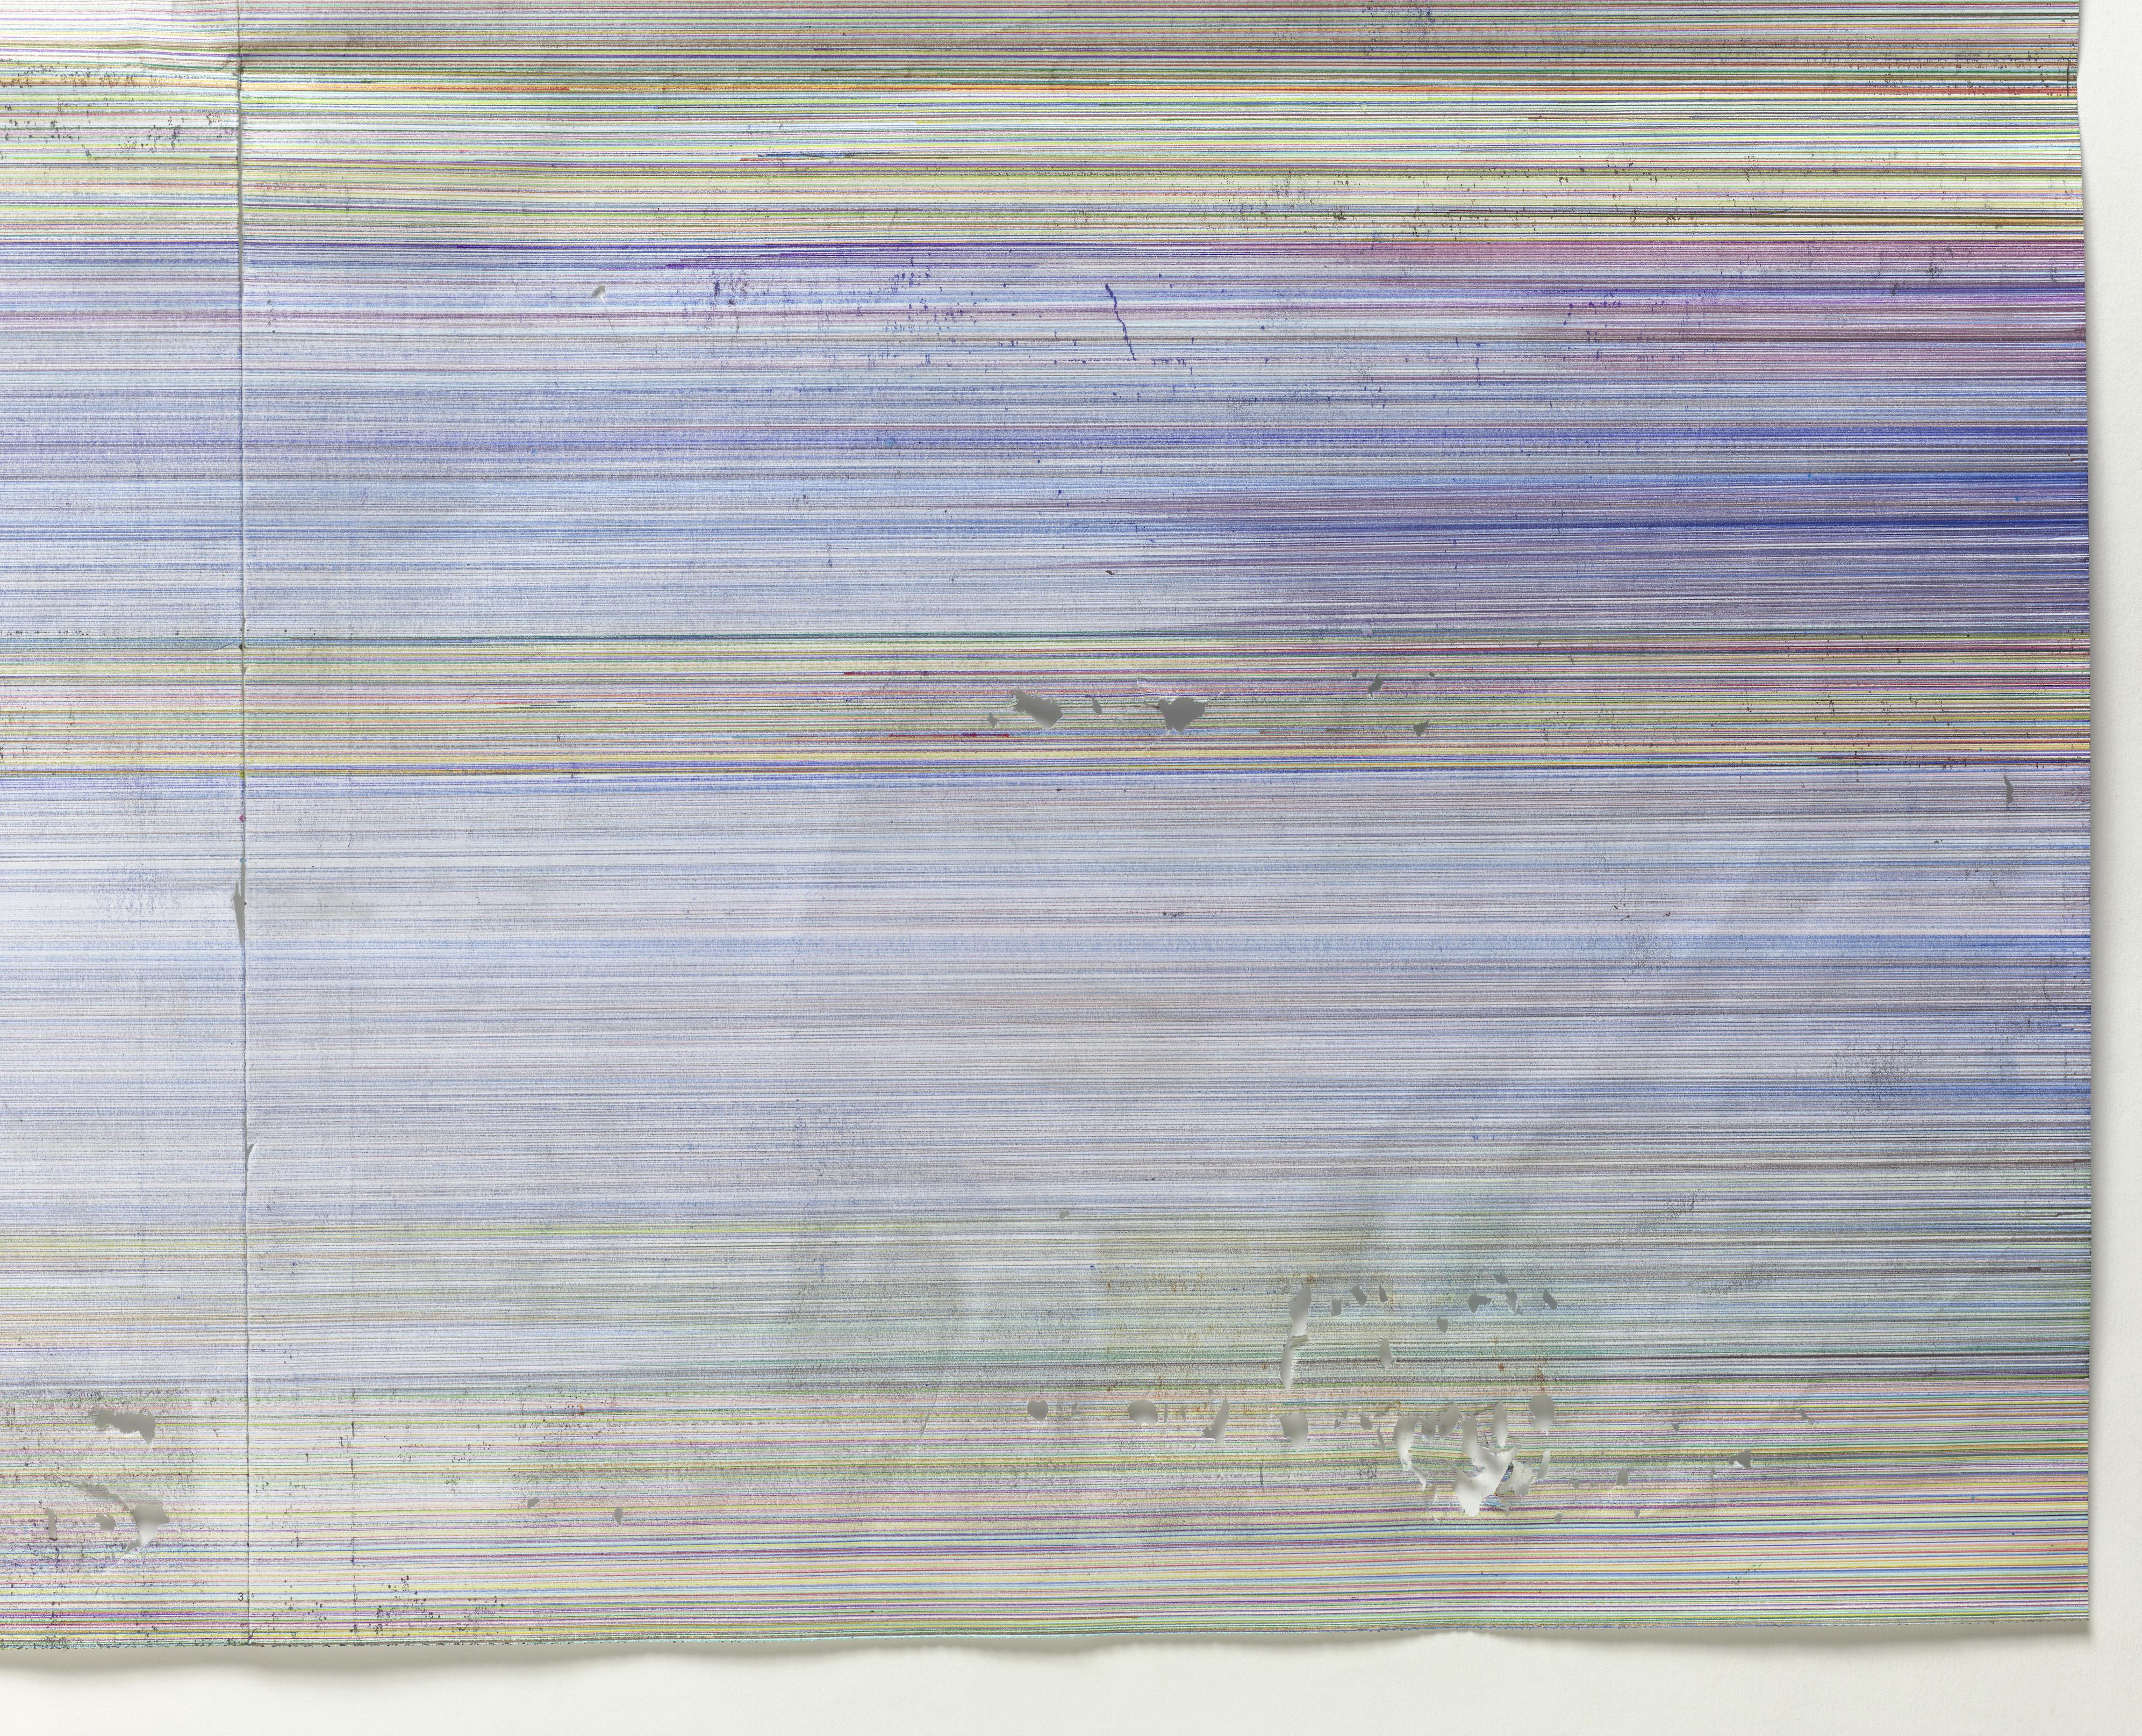 121e-a-rhythm-of-landscape-9-detail-4